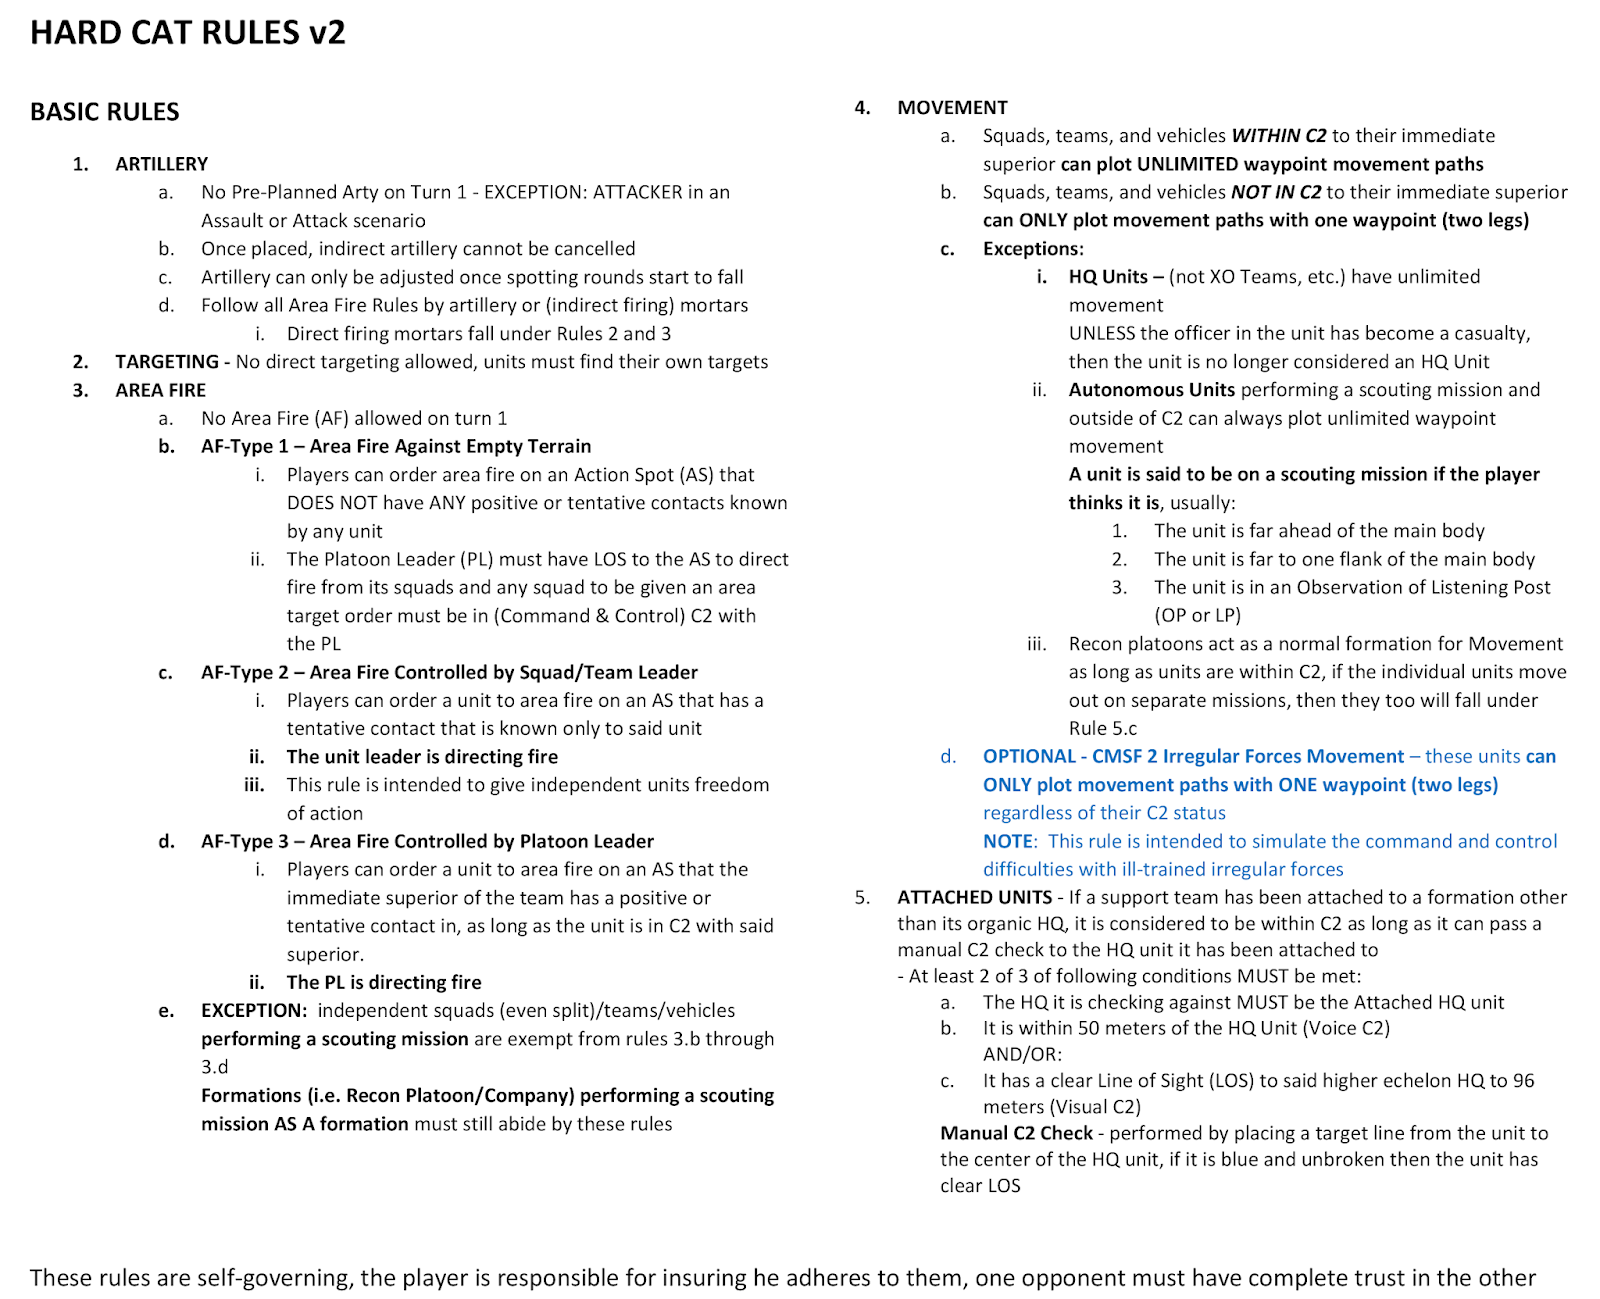 HARD-CAT+Rules+v2g-01.png